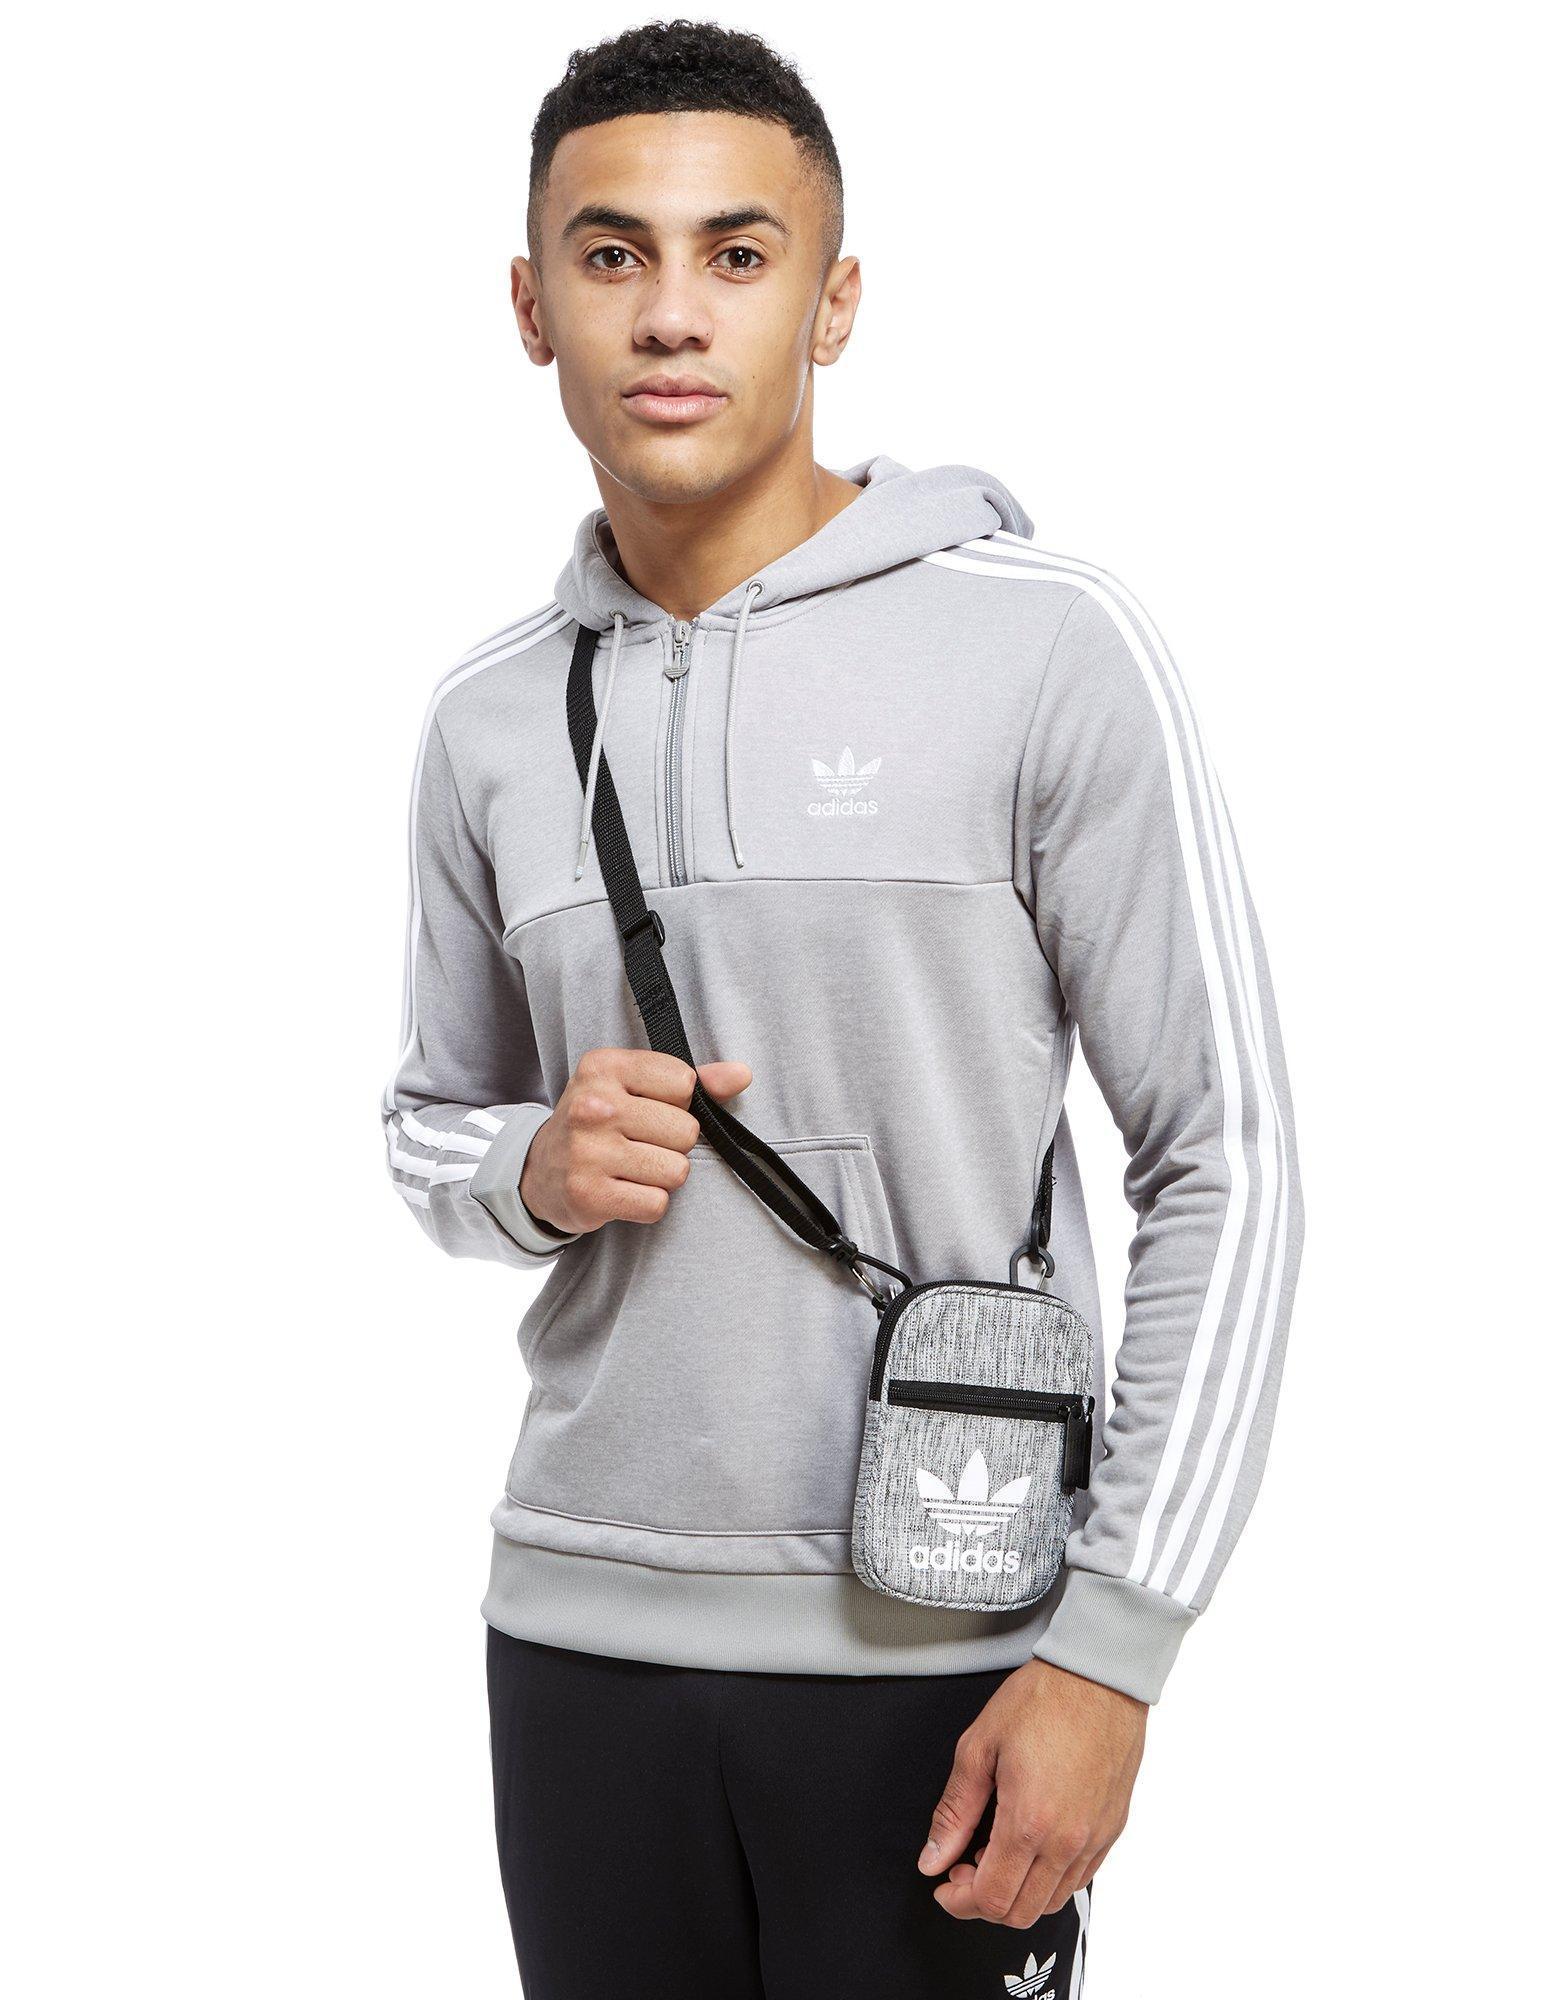 Lyst - adidas Originals Trefoil Festival Bag in Gray for Men 9357e25a5ae64